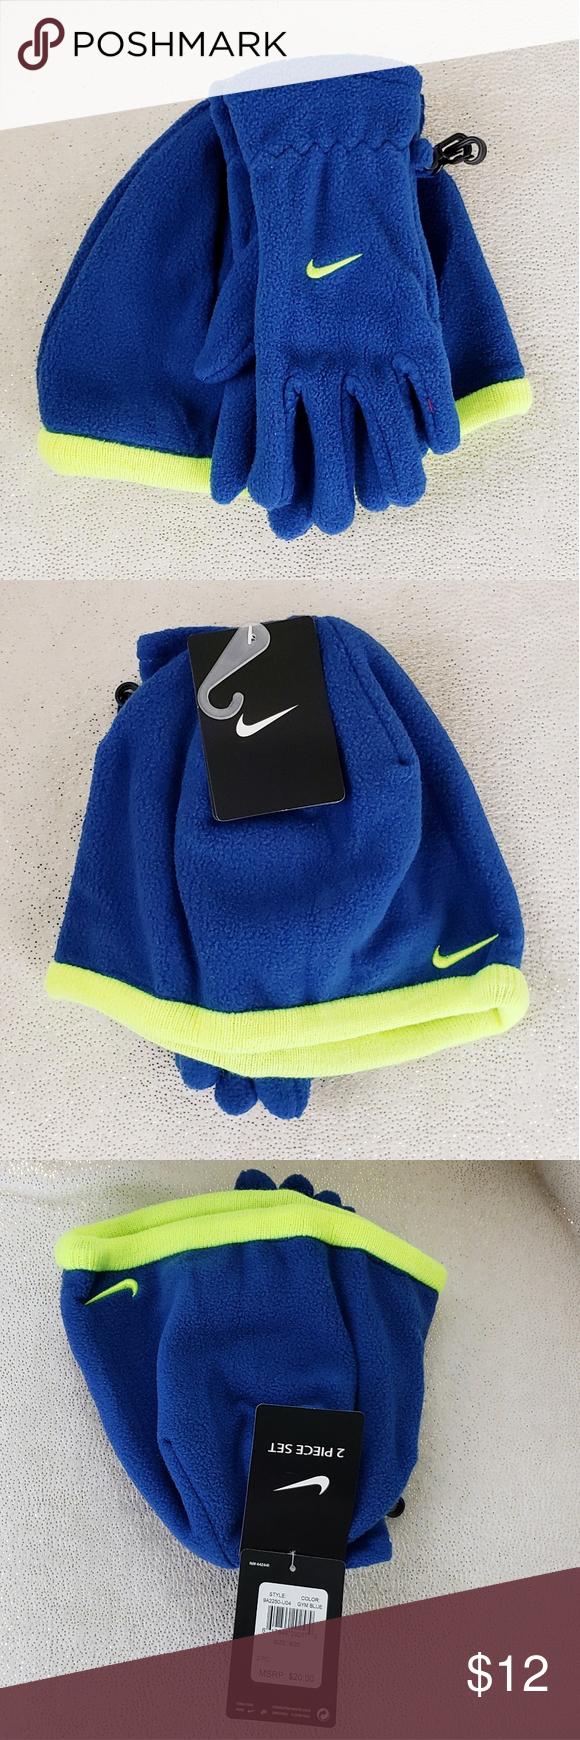 14d4ff03e2e Kid s Nike 2-piece Hat and Glove Set Nike fleece beanie hat and glove set